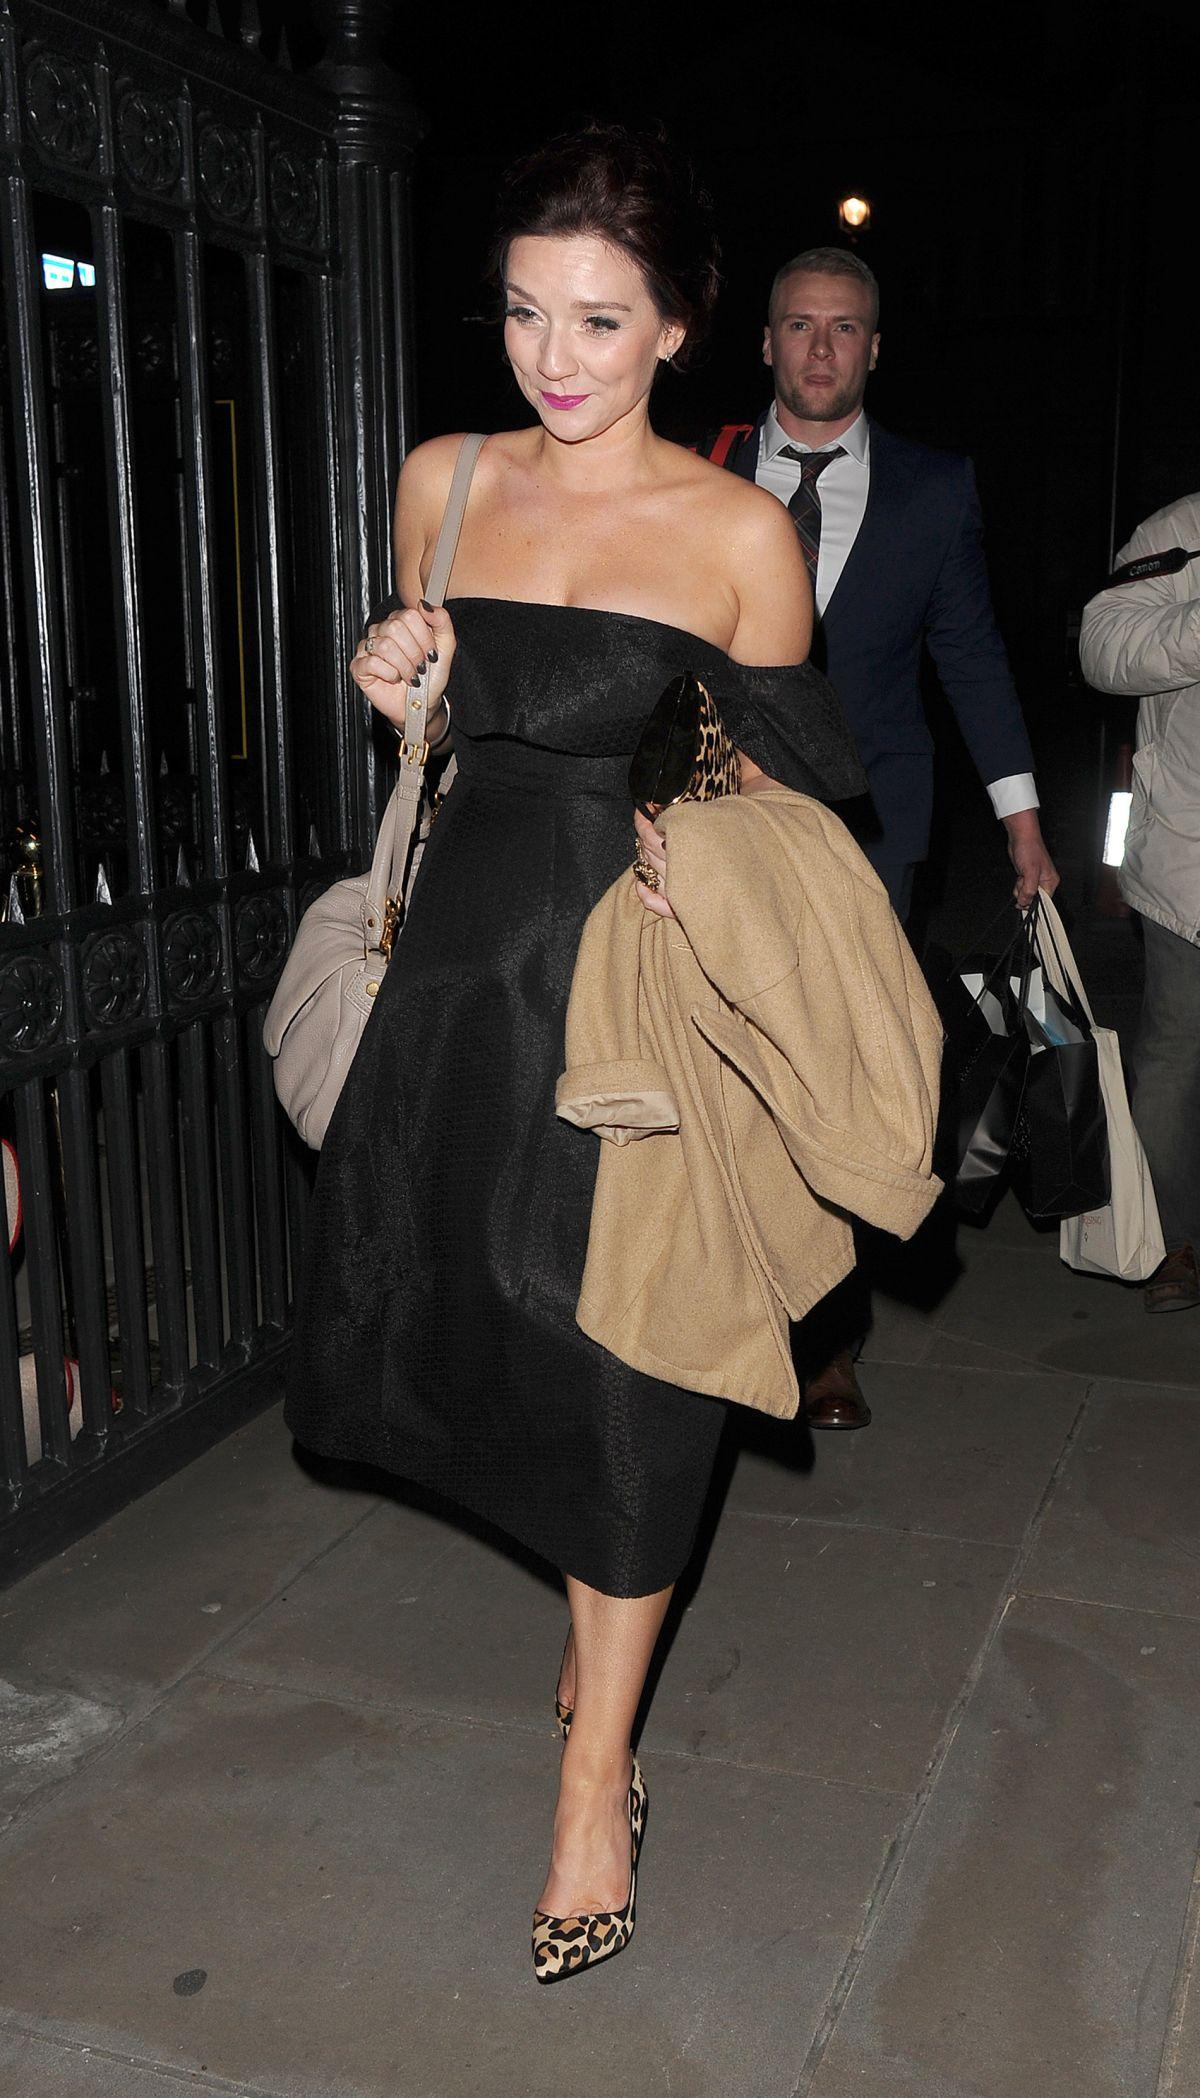 Demi Rose Leaves the Beauty Awards in London - Celebzz